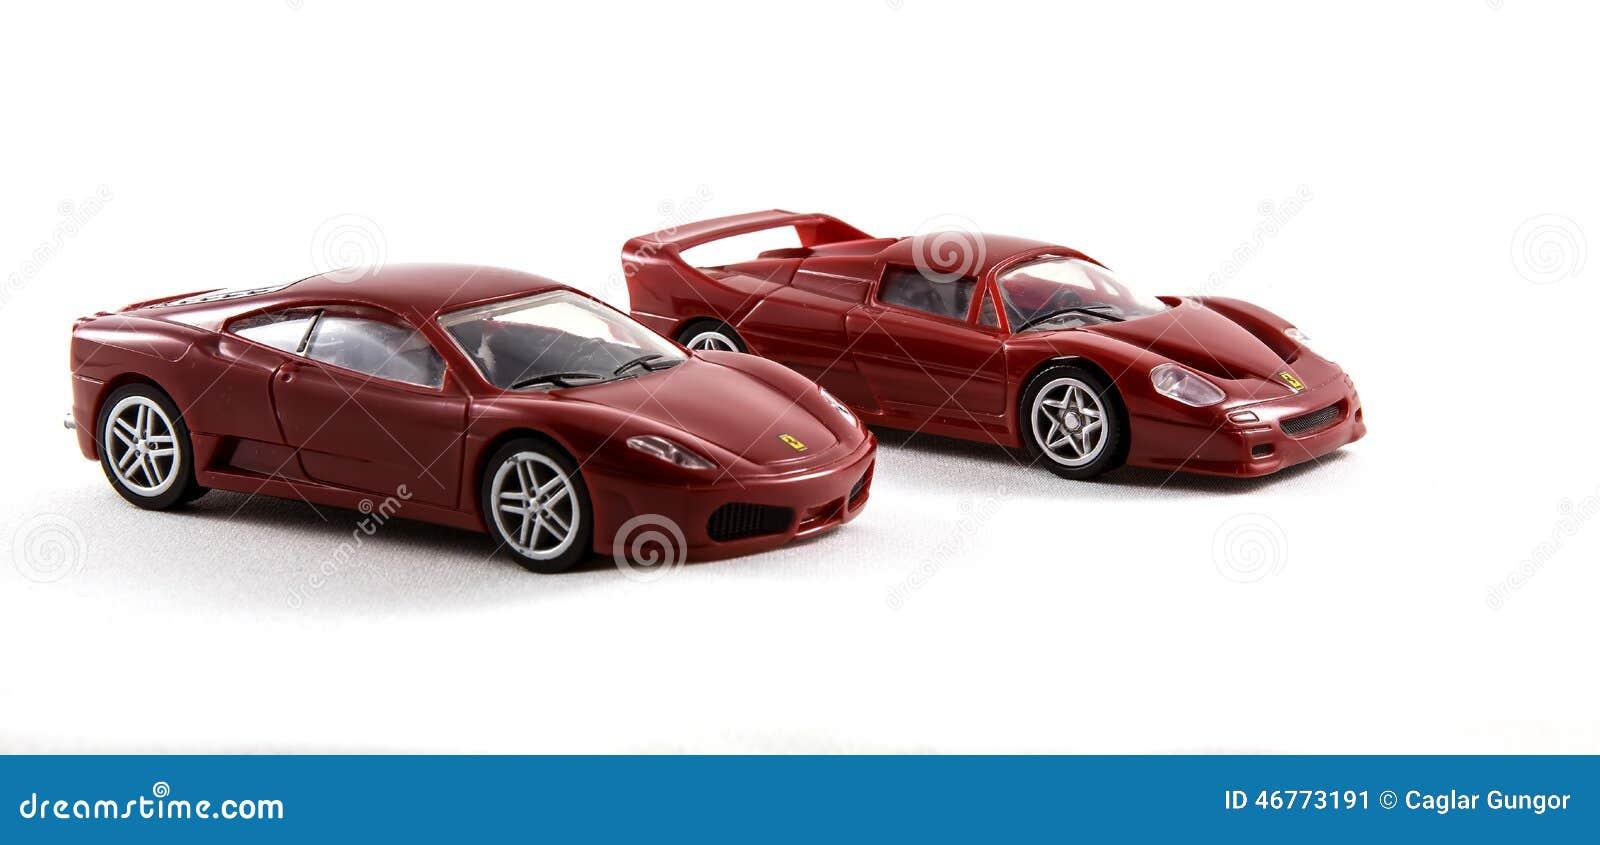 Toy Ferrari Cars